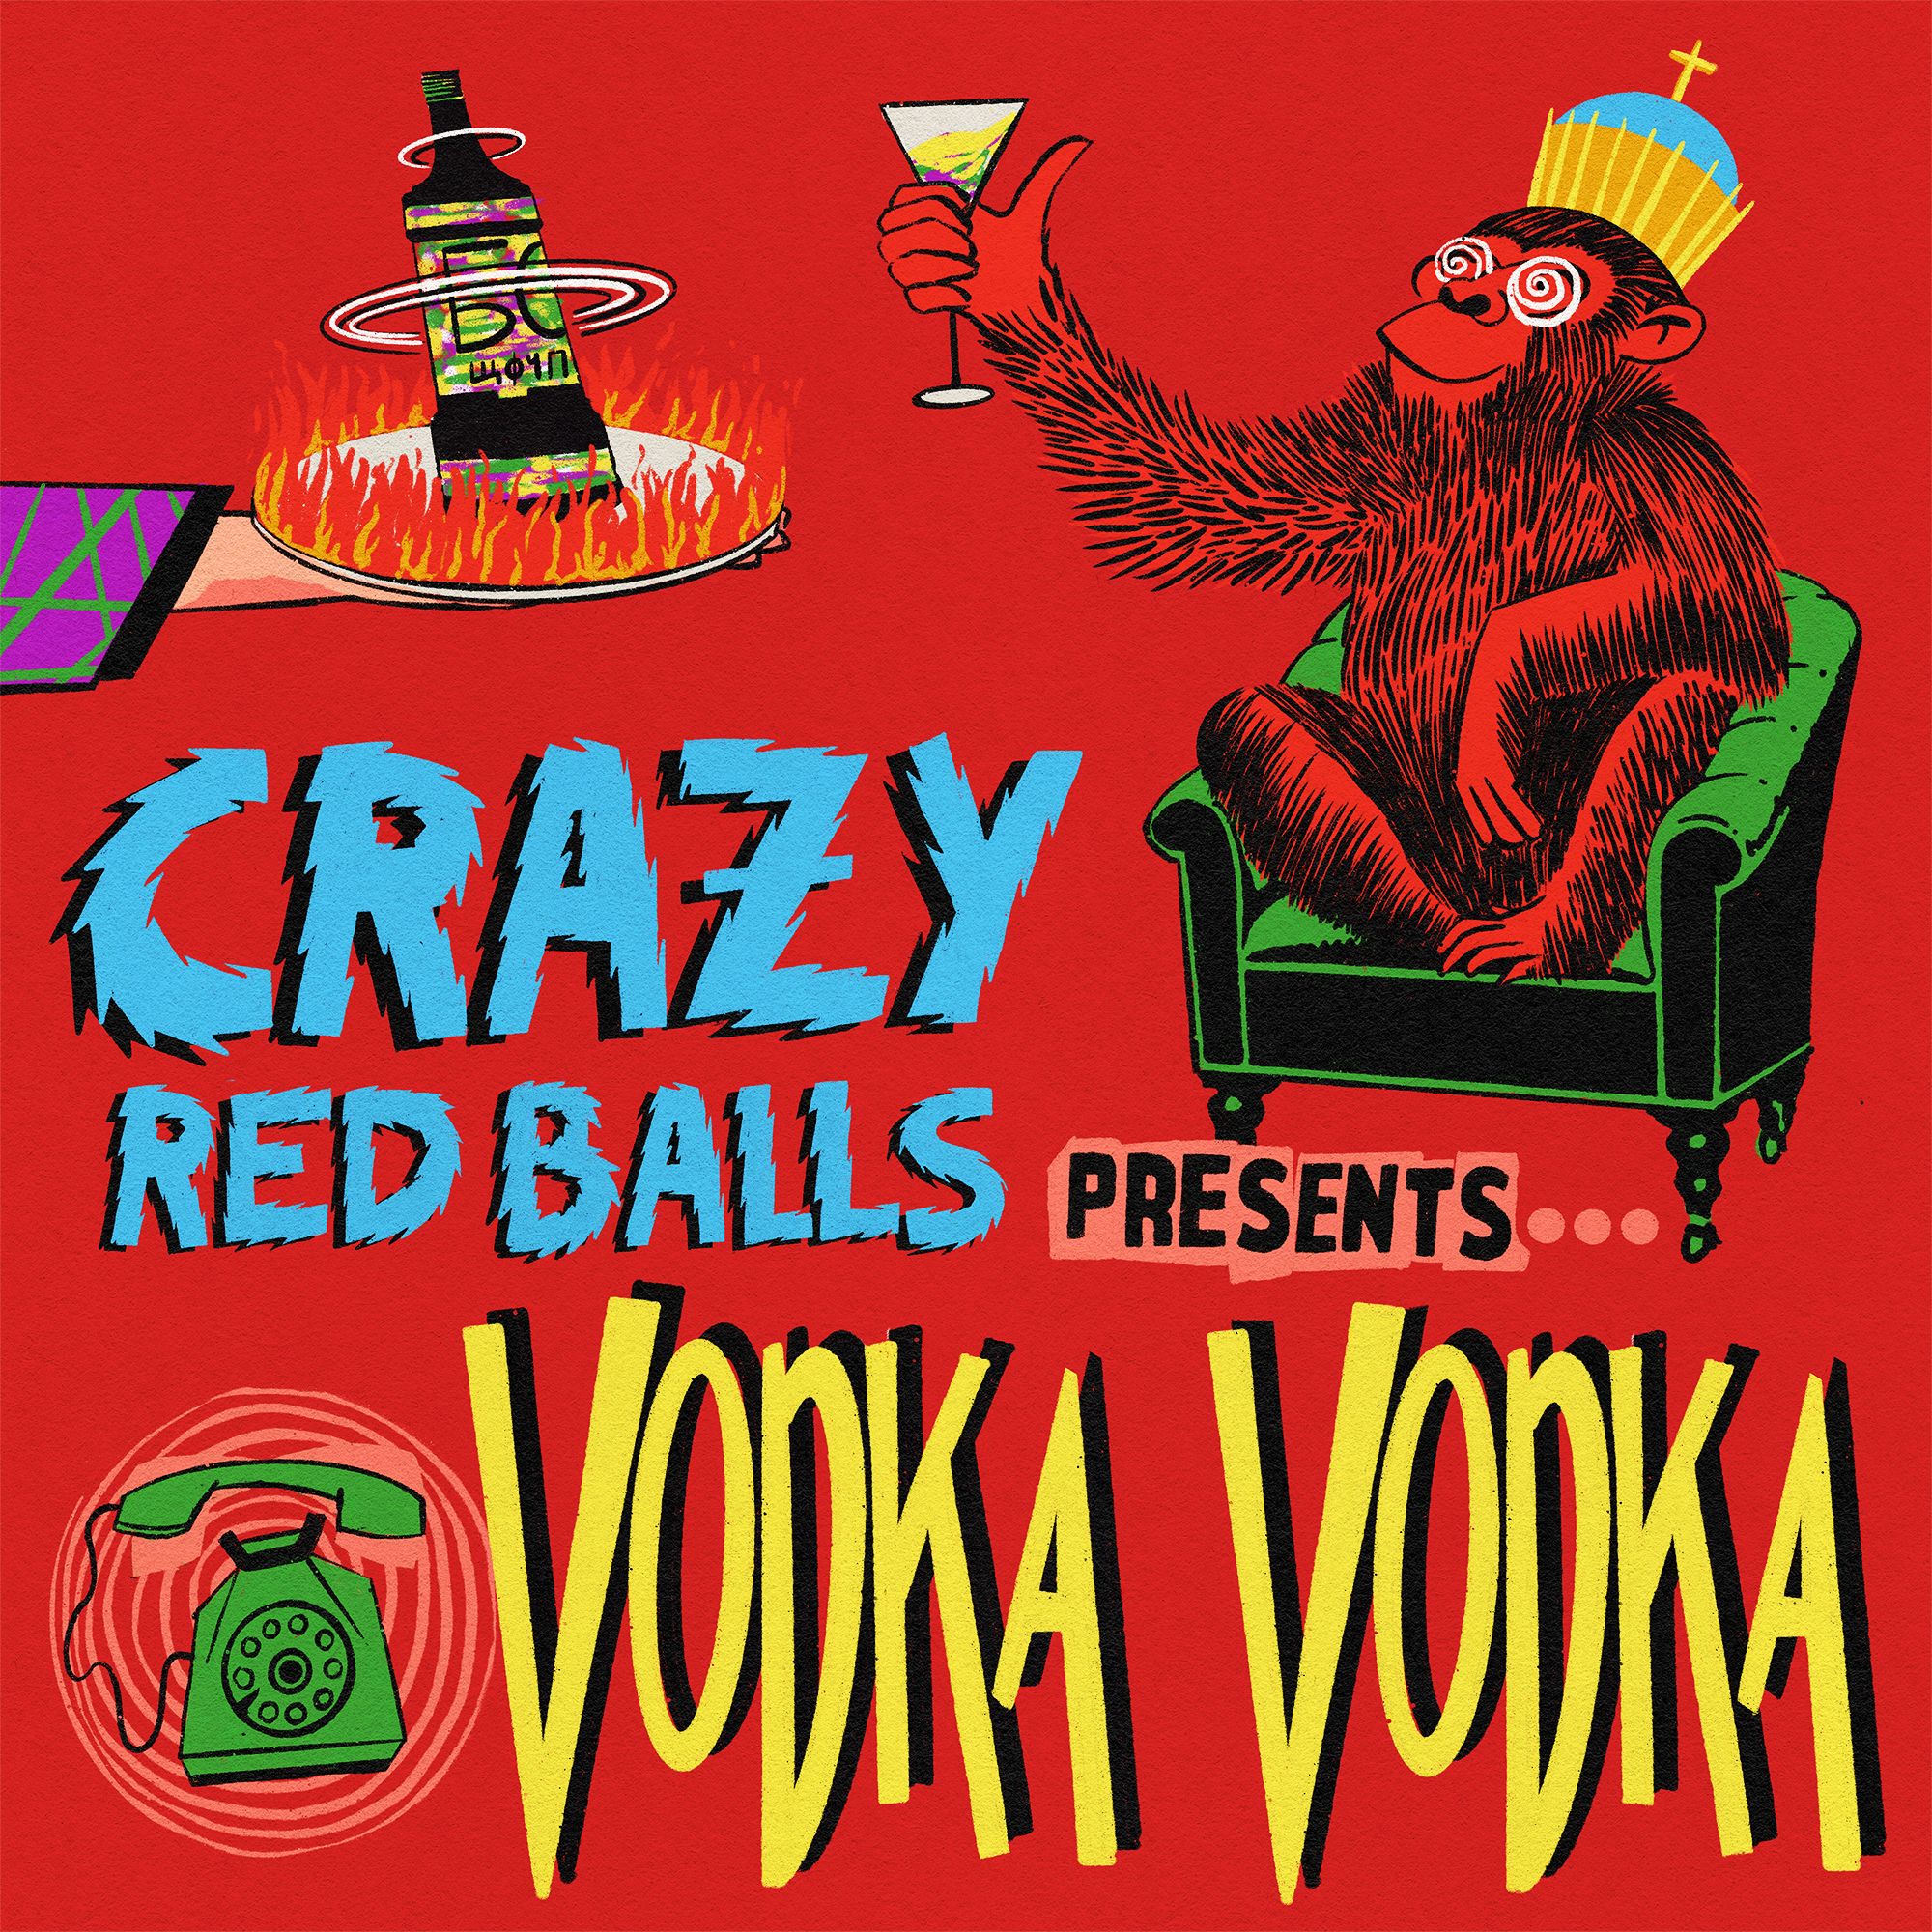 Vodka Vodka by Crazy Red Balls Image